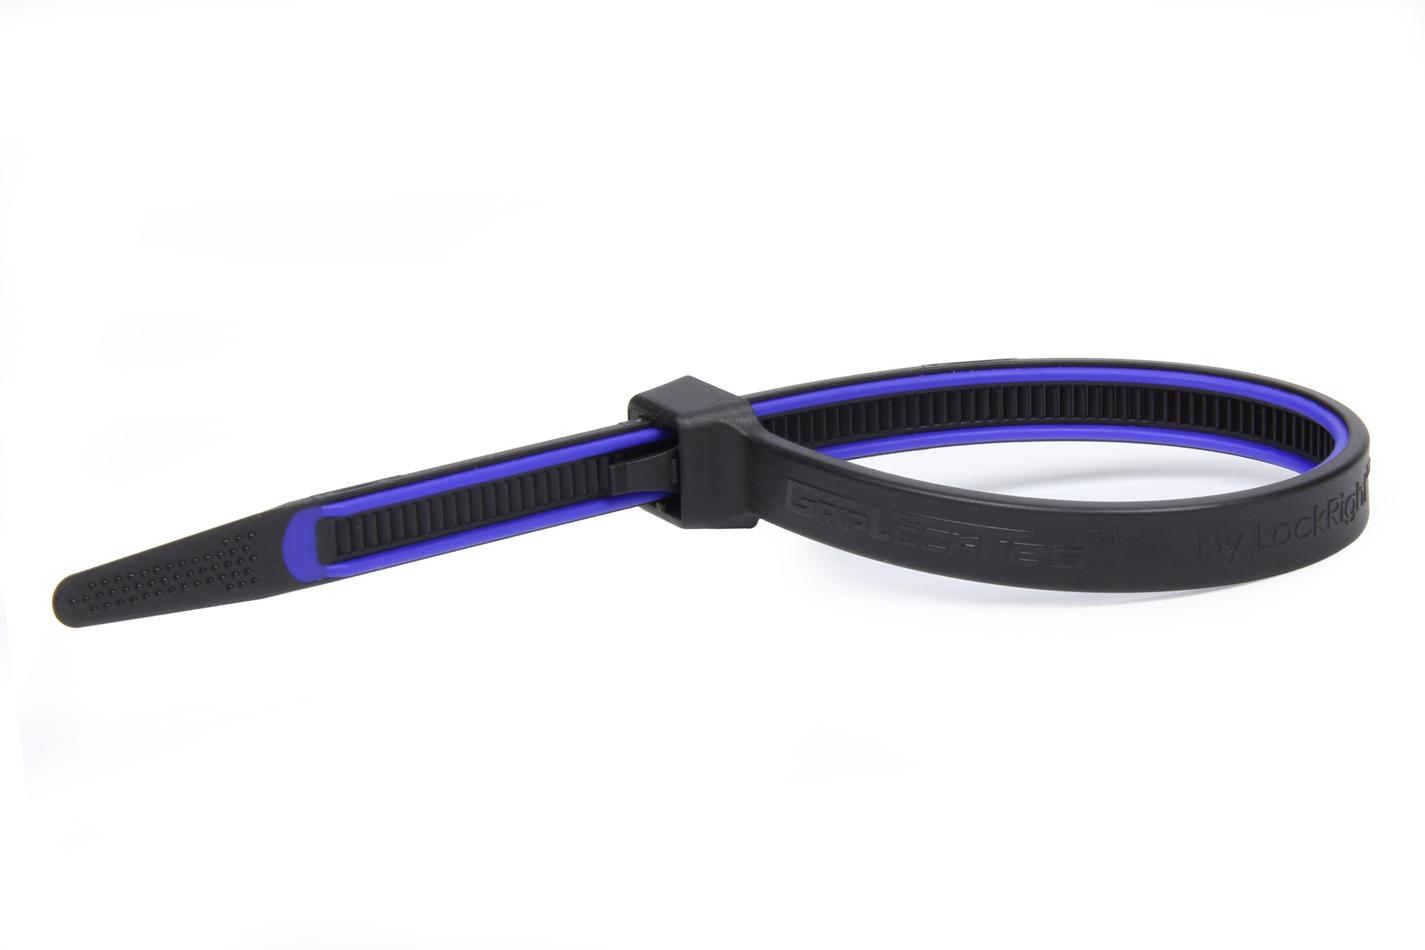 Grip Lock Ties 2912BKBUHB100 Cable Ties, Zip Ties, 12 in Long, Blue Rubber Lined, Nylon, Black, Reusable, Set of 100